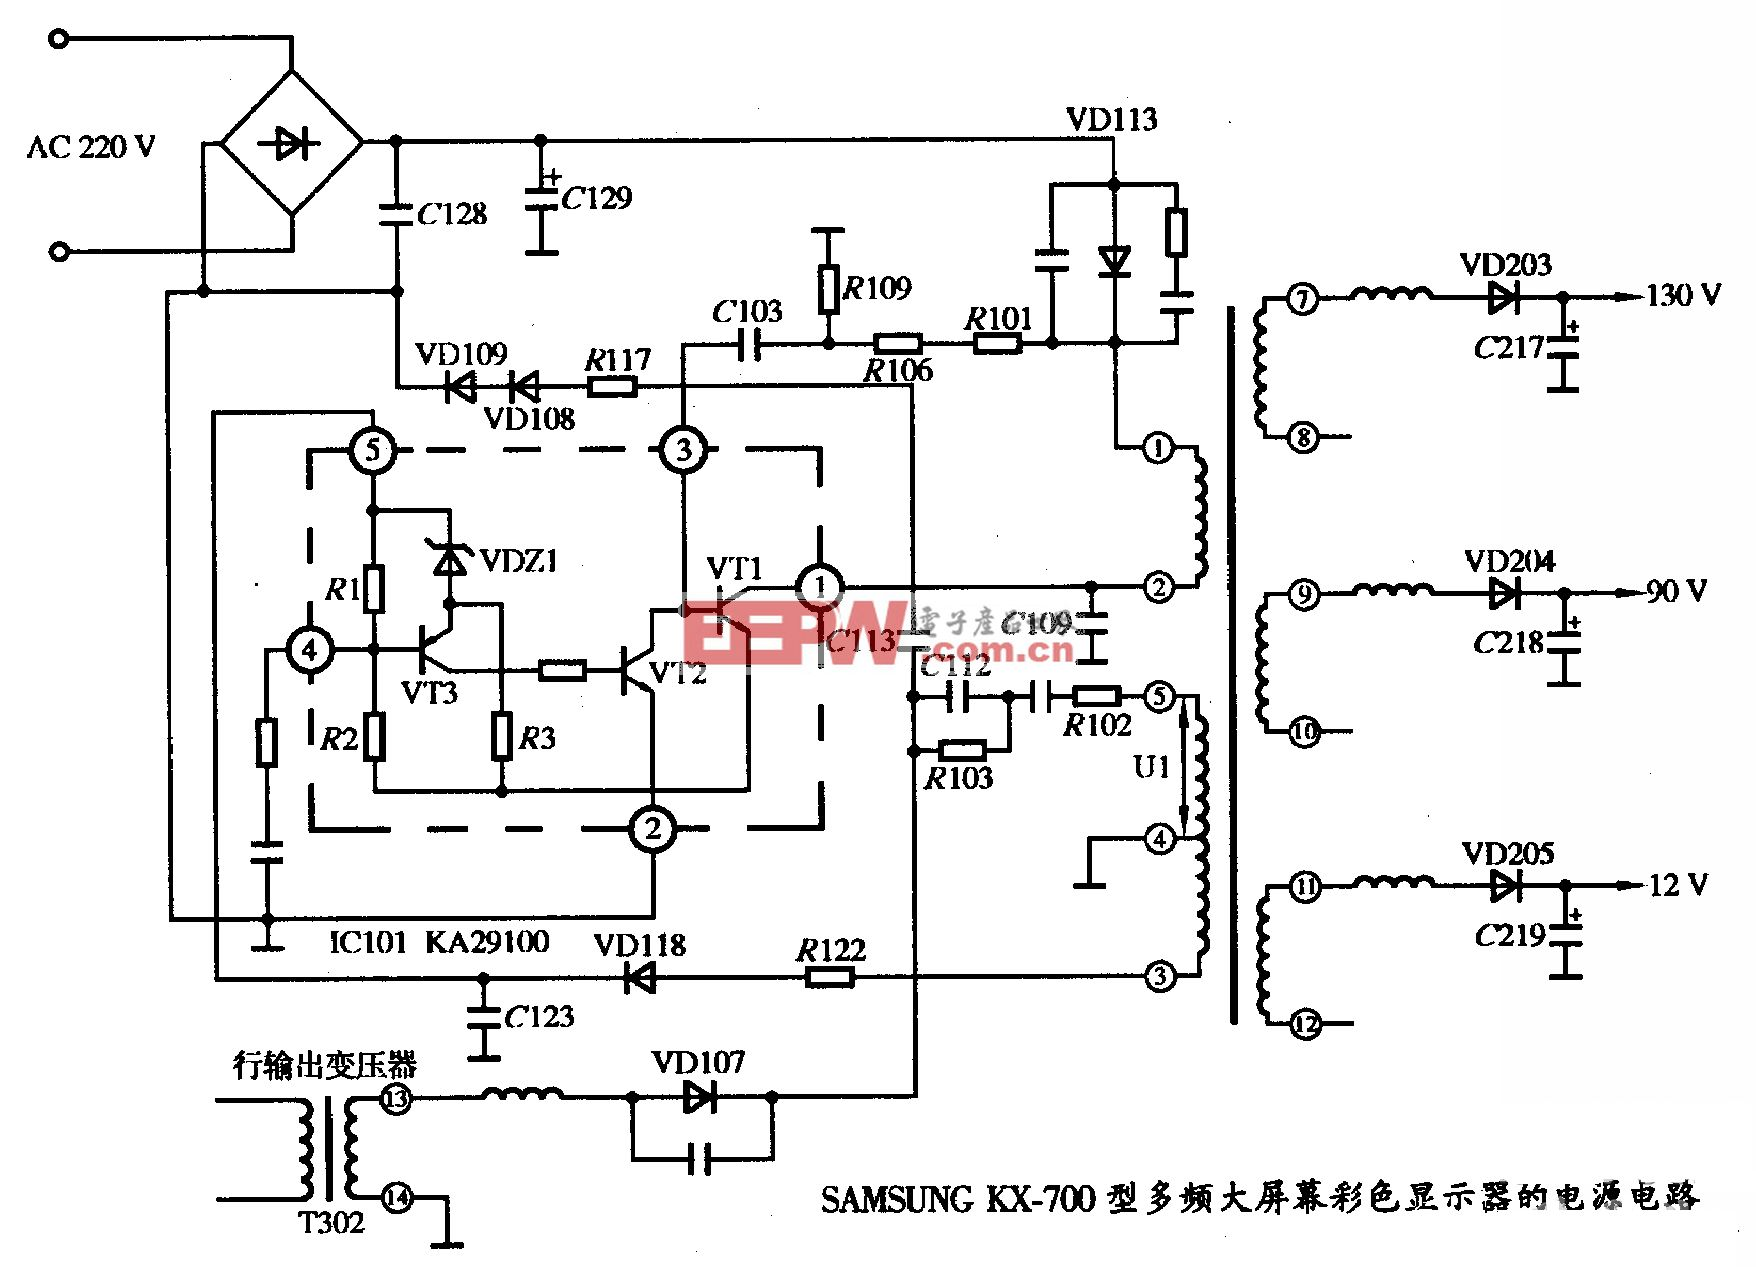 SAMSUNG KX-700型多频大屏幕彩色显示器的电源电路图